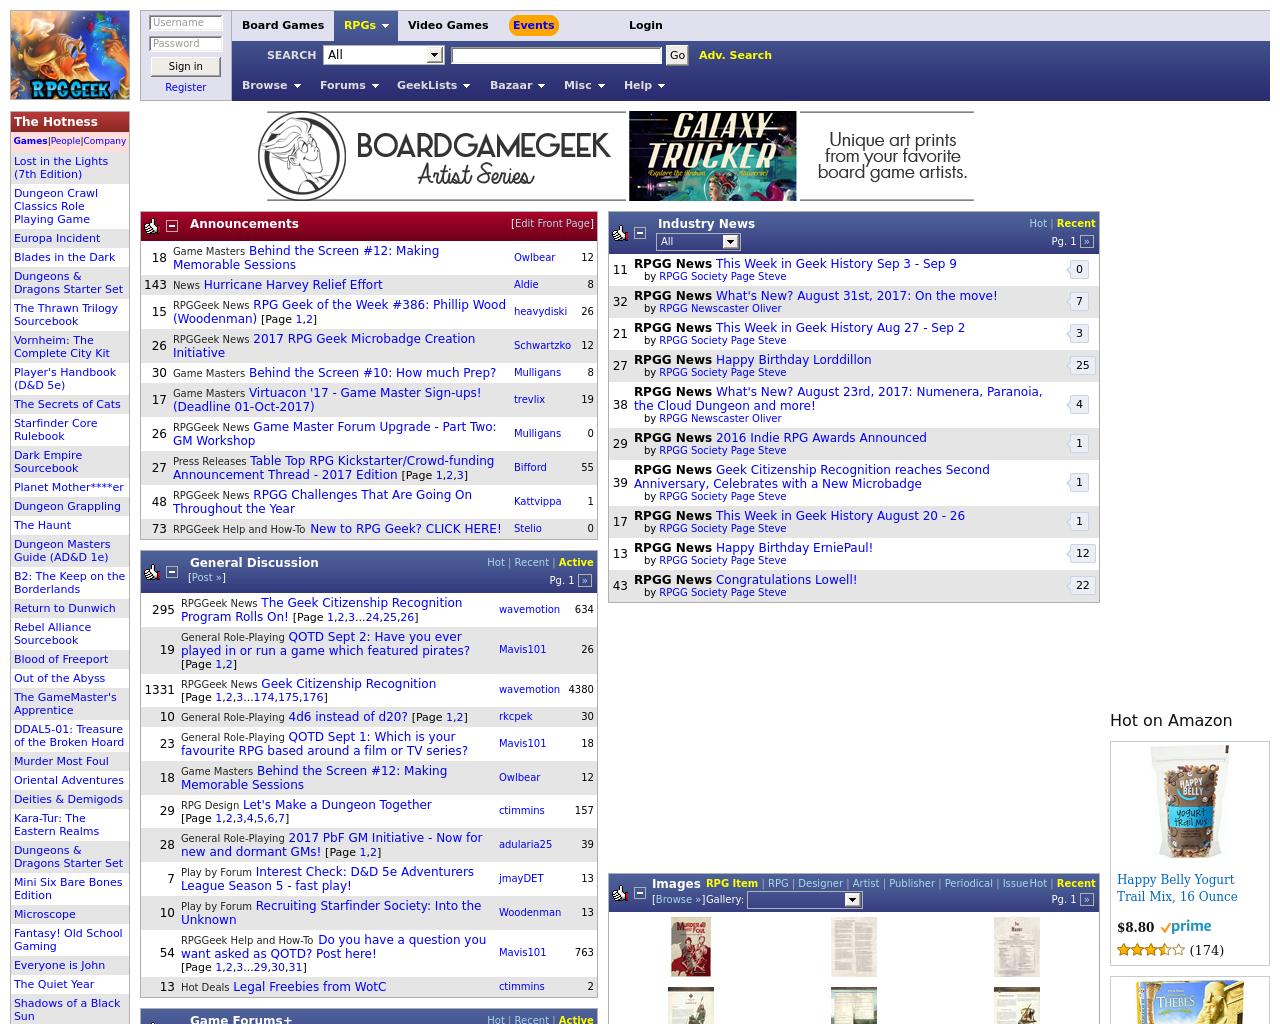 RPGGeek-Advertising-Reviews-Pricing